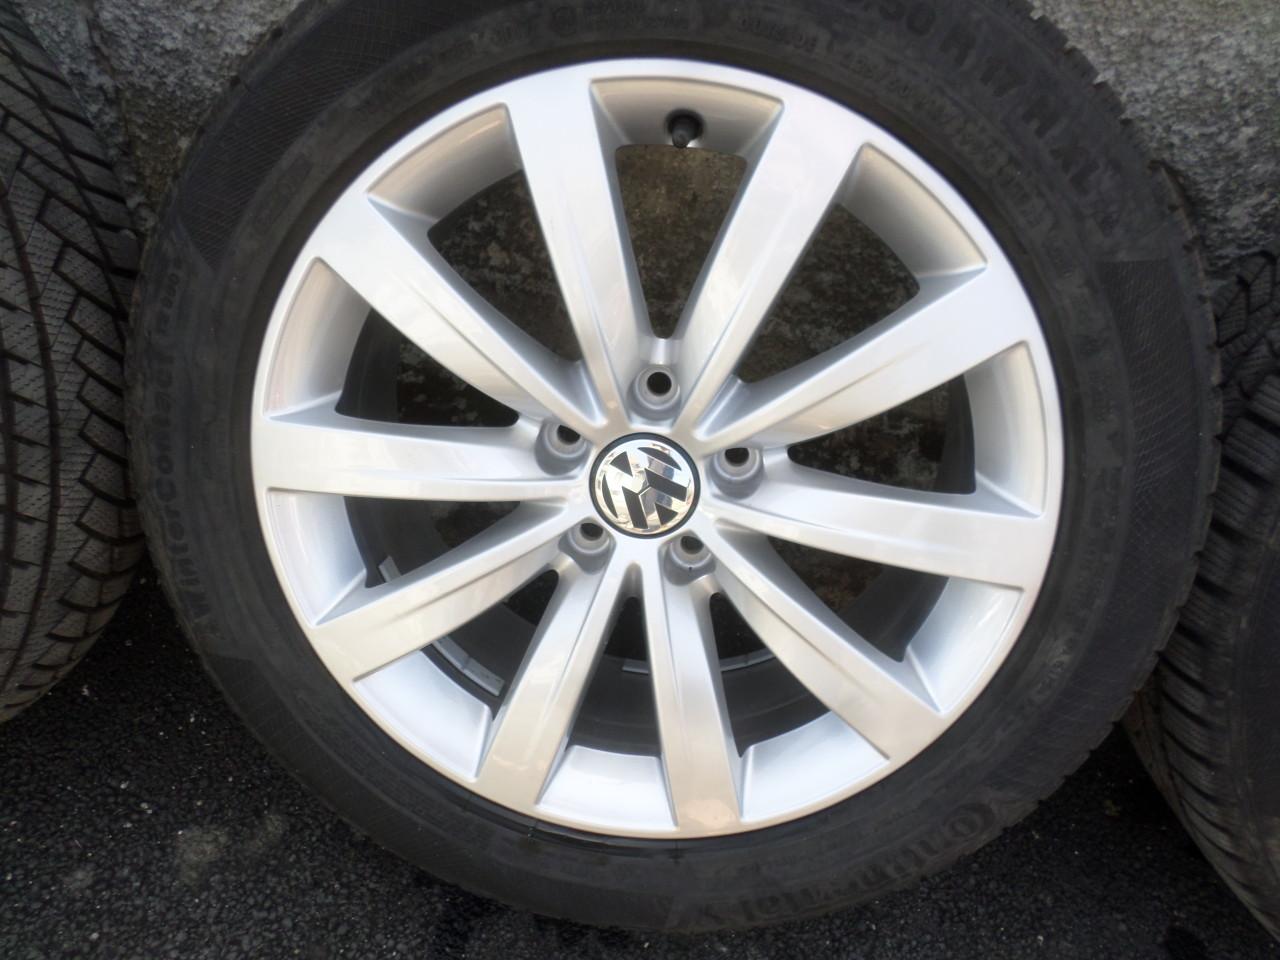 Jante VW Sharan 7N  model SYDNEY  225 50 17 iarna Continental  dot 3017